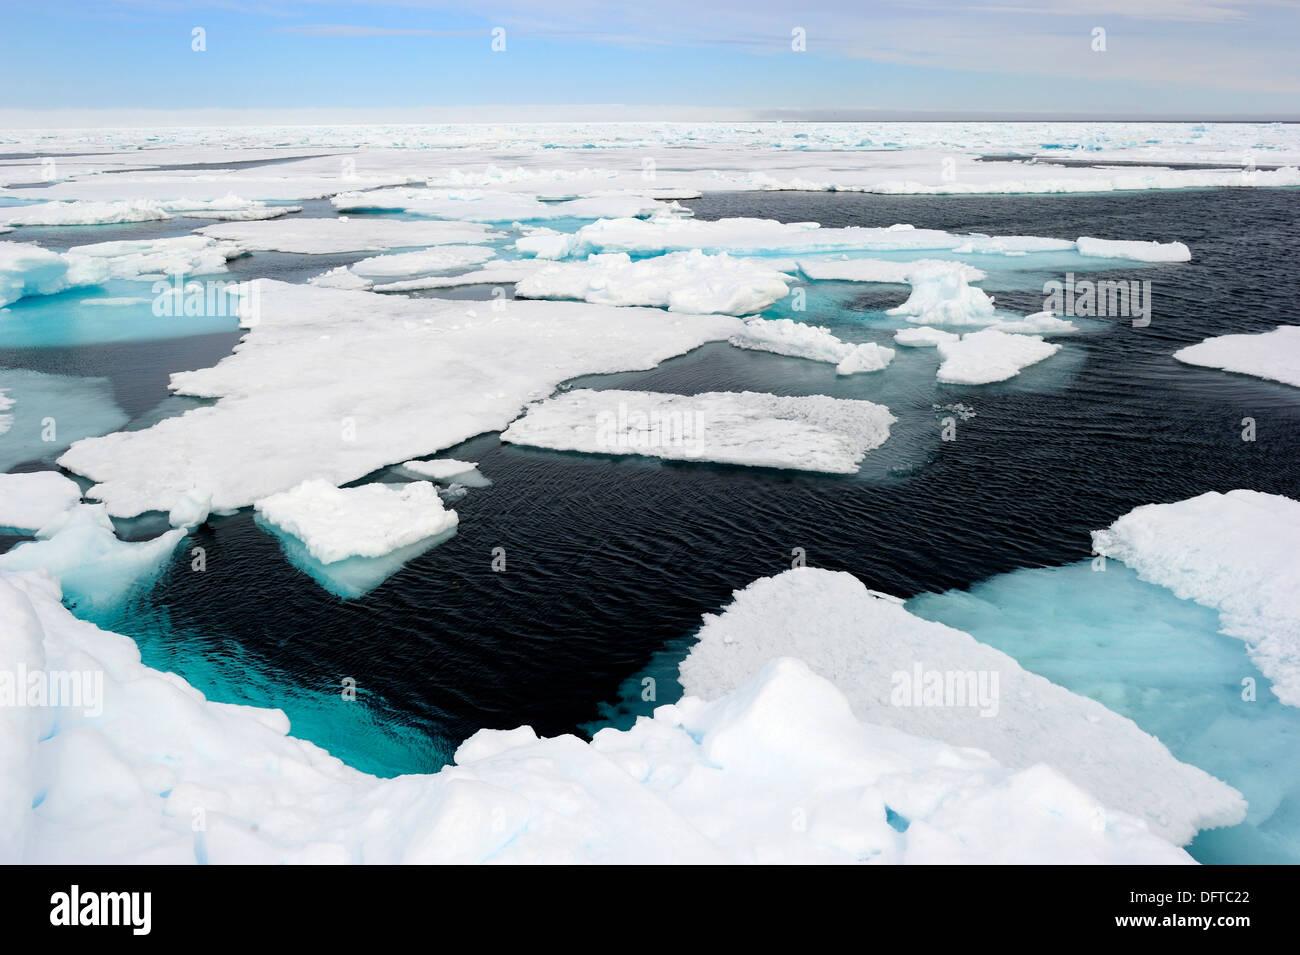 Melting ice, Floe Edge, Arctic Bay, Baffin Island, Nunavut, Canada - Stock Image